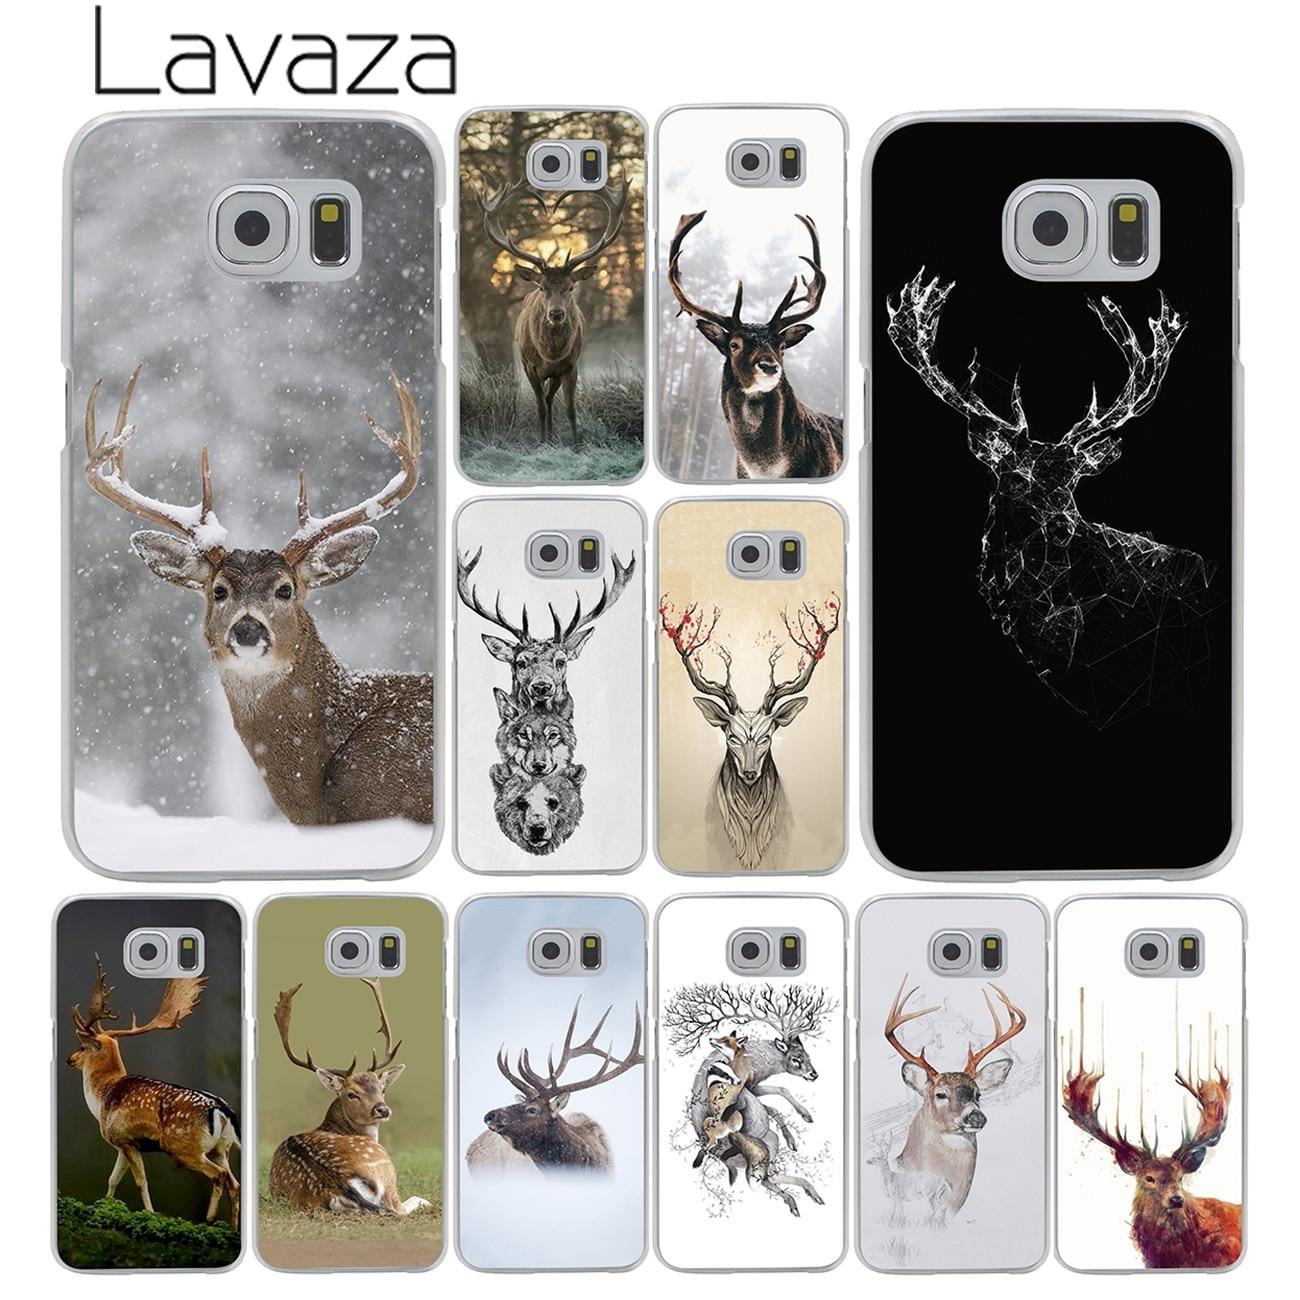 new style c5fcd 8069f Minimalist Animal Deer Minimalistic Animals Hard Phone Samsung Galaxy S8 S9  Plus S3 S4 S5 S6 S7 Edge Cover